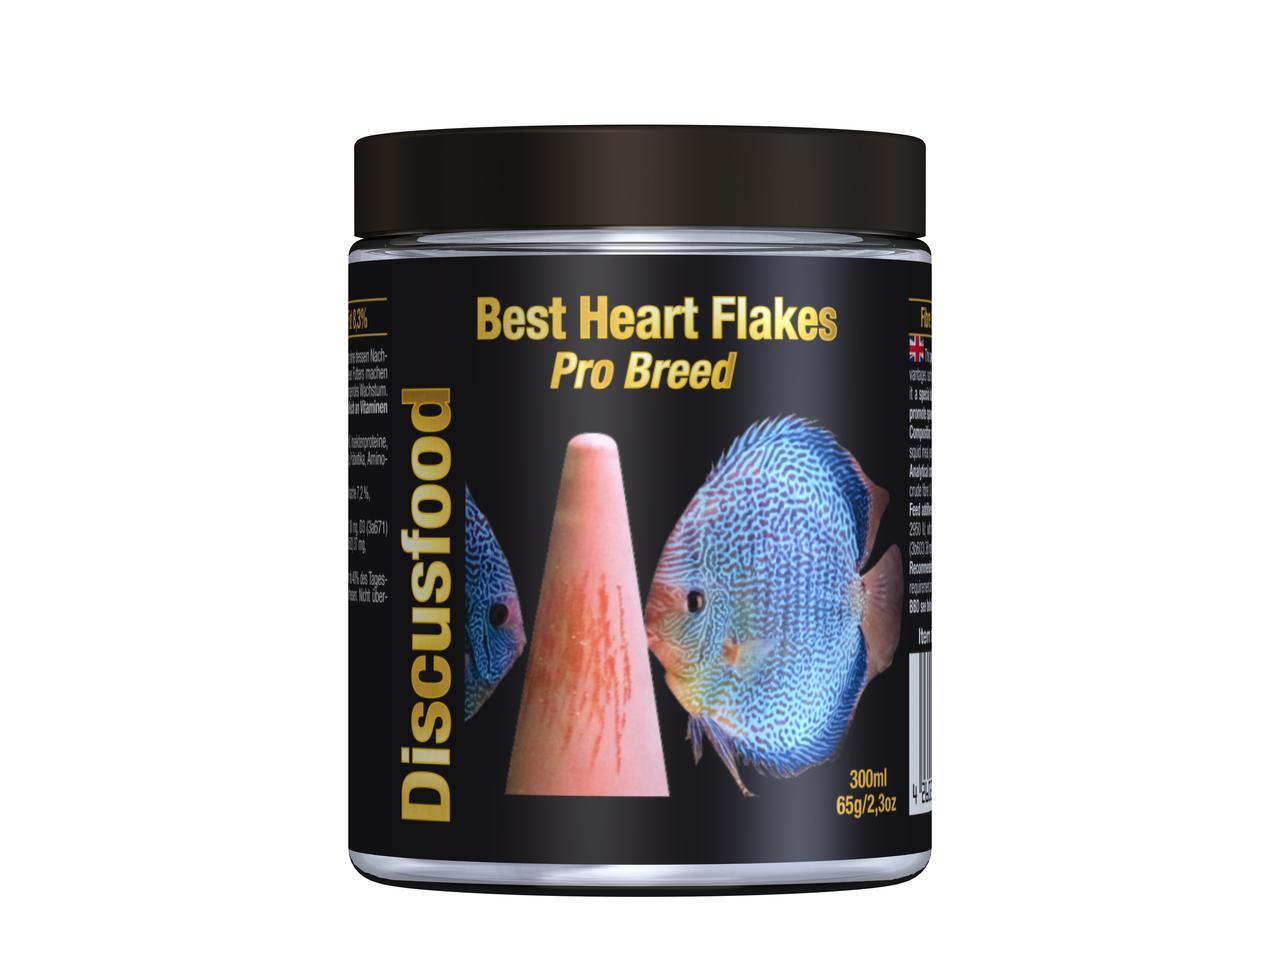 Корм для Дискусов. Discusfood Best Heart Flakes Pro Breed. Дискусфуд Супер Рост. Хлопья